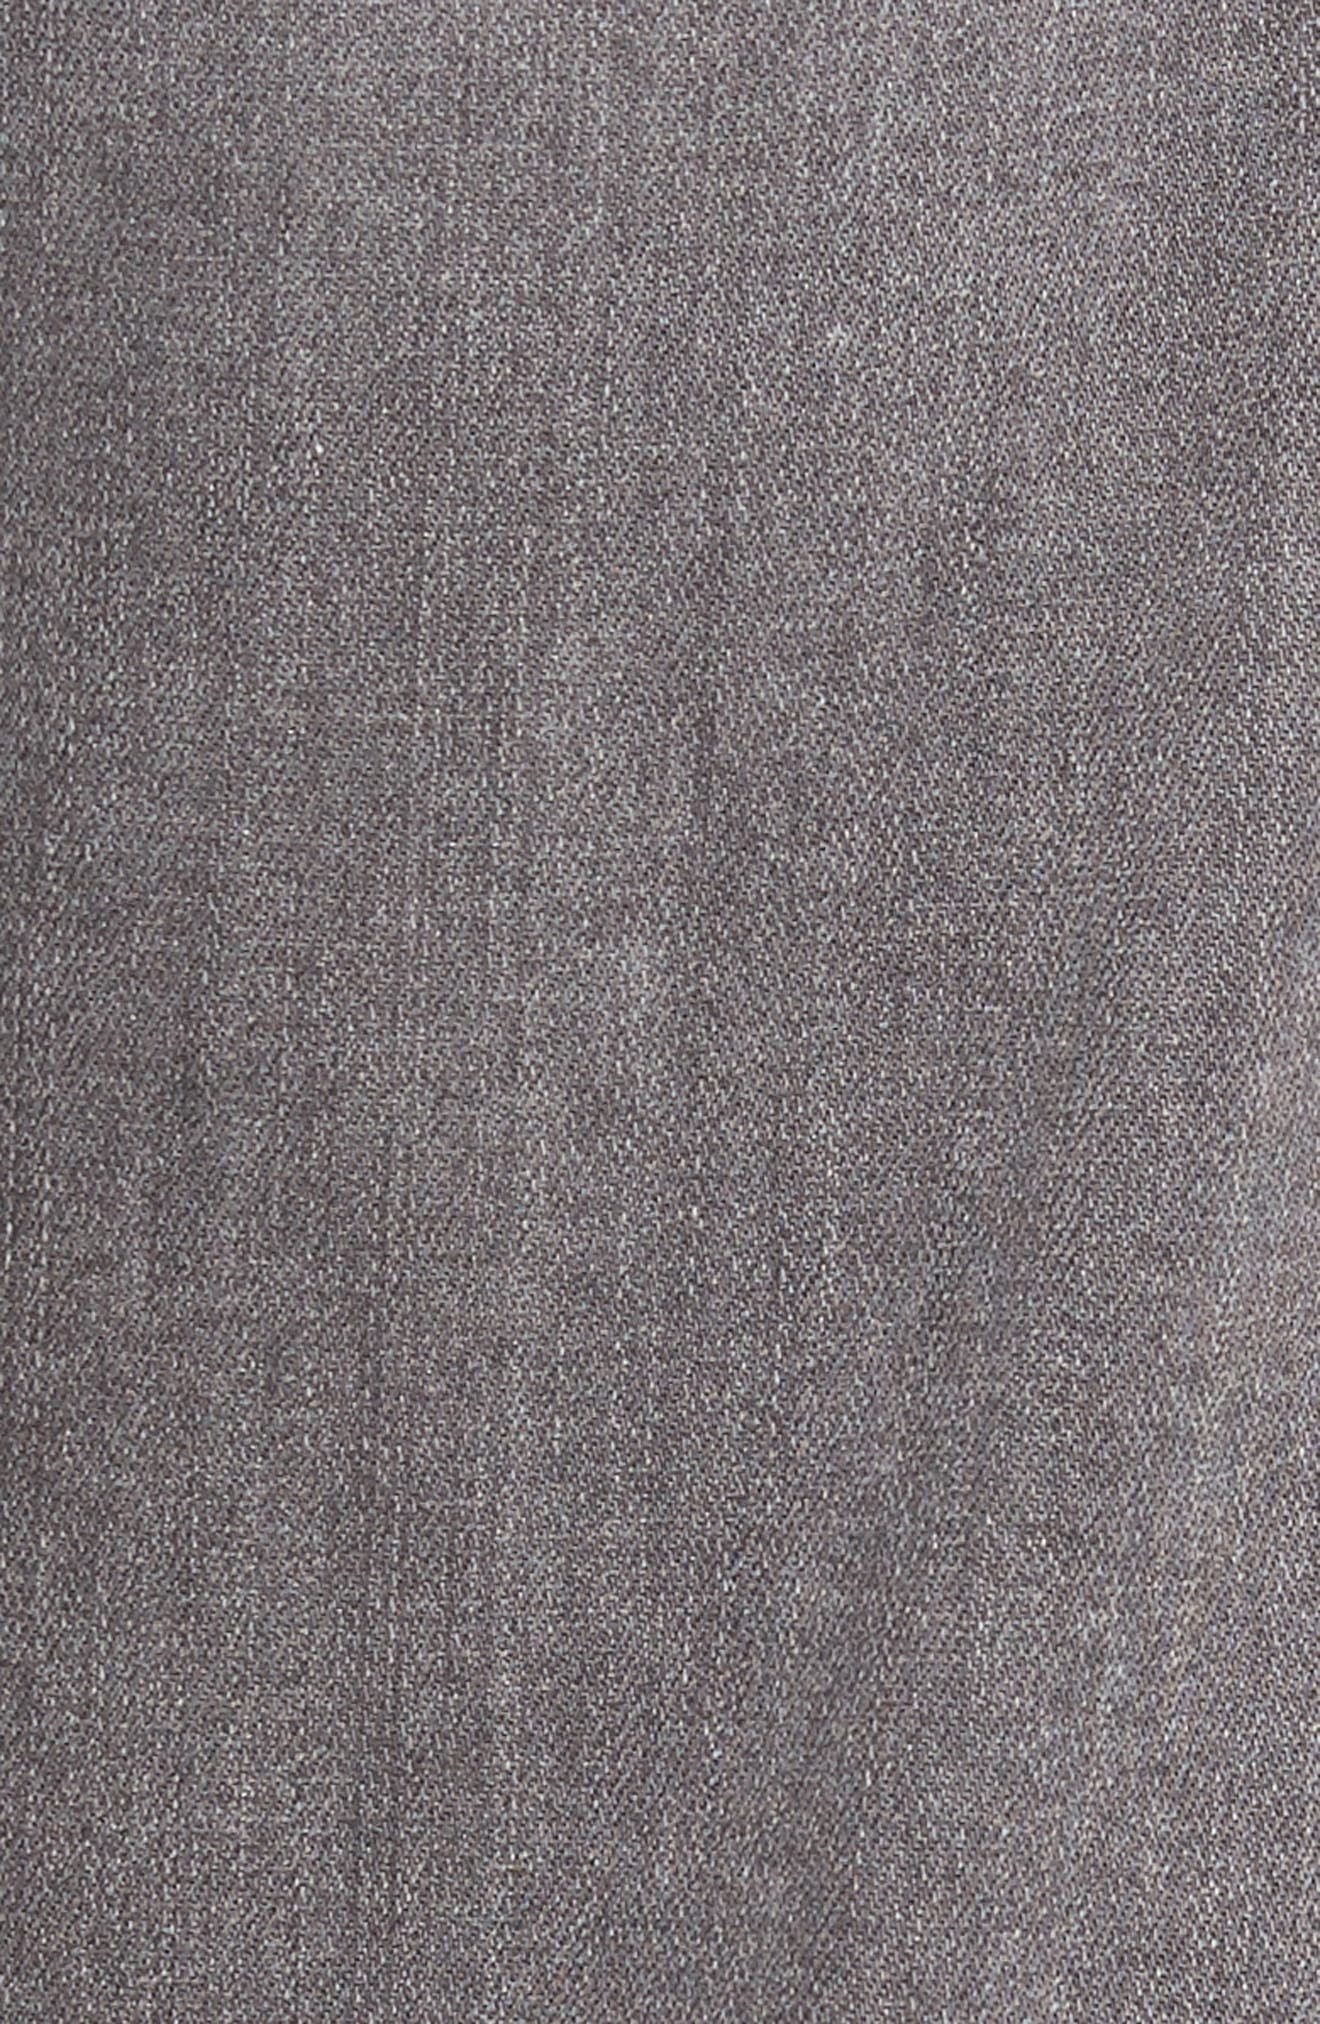 Normandie Straight Leg Jeans,                             Alternate thumbnail 5, color,                             030